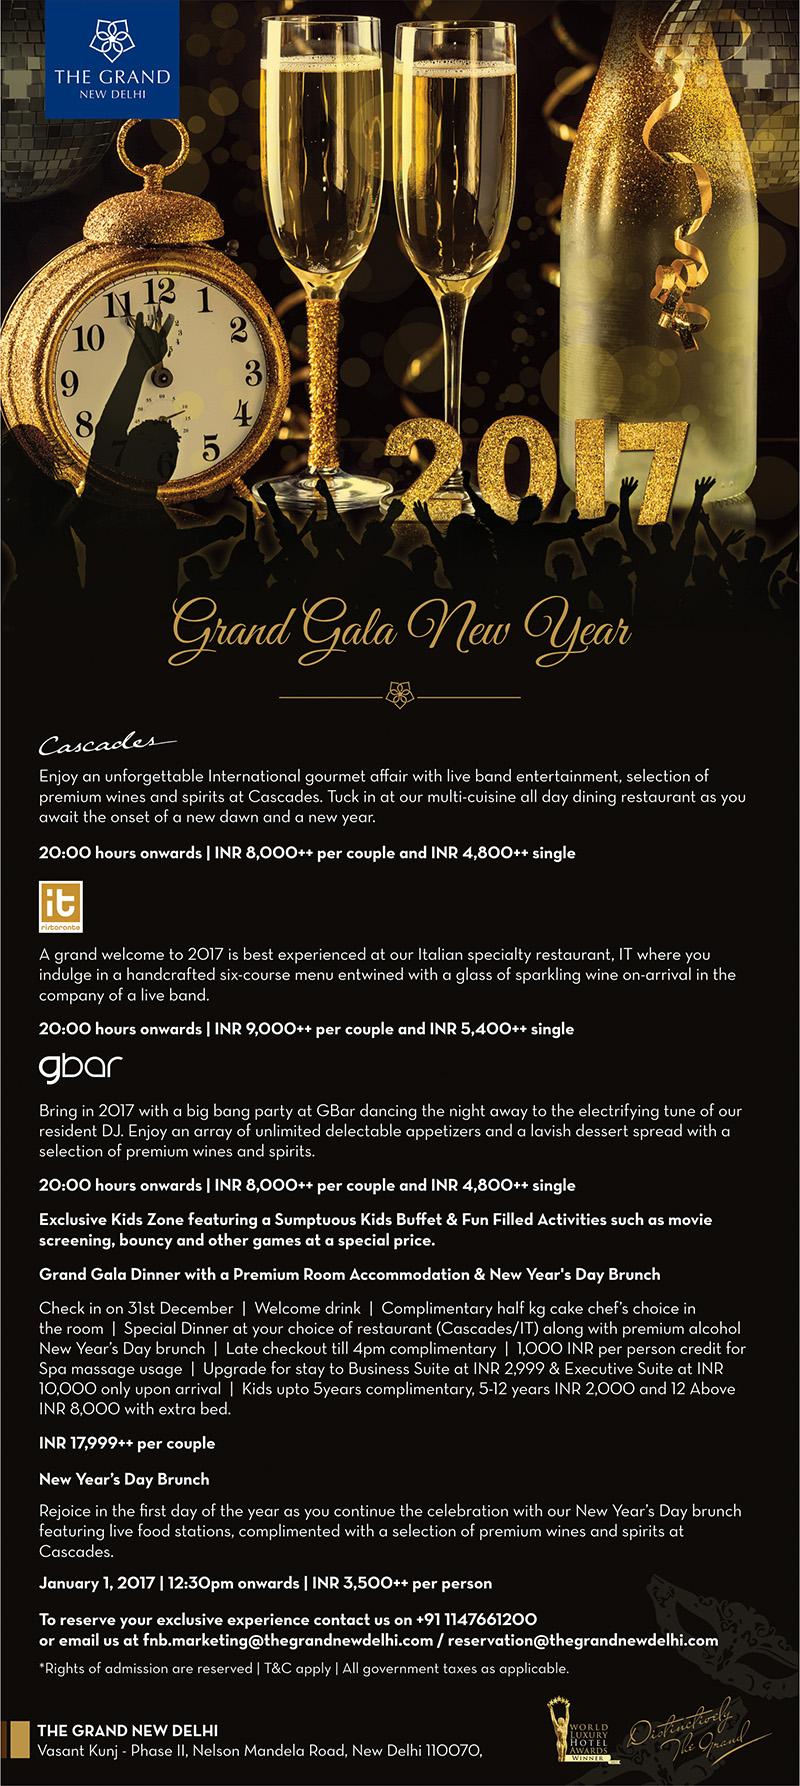 grand gala new year